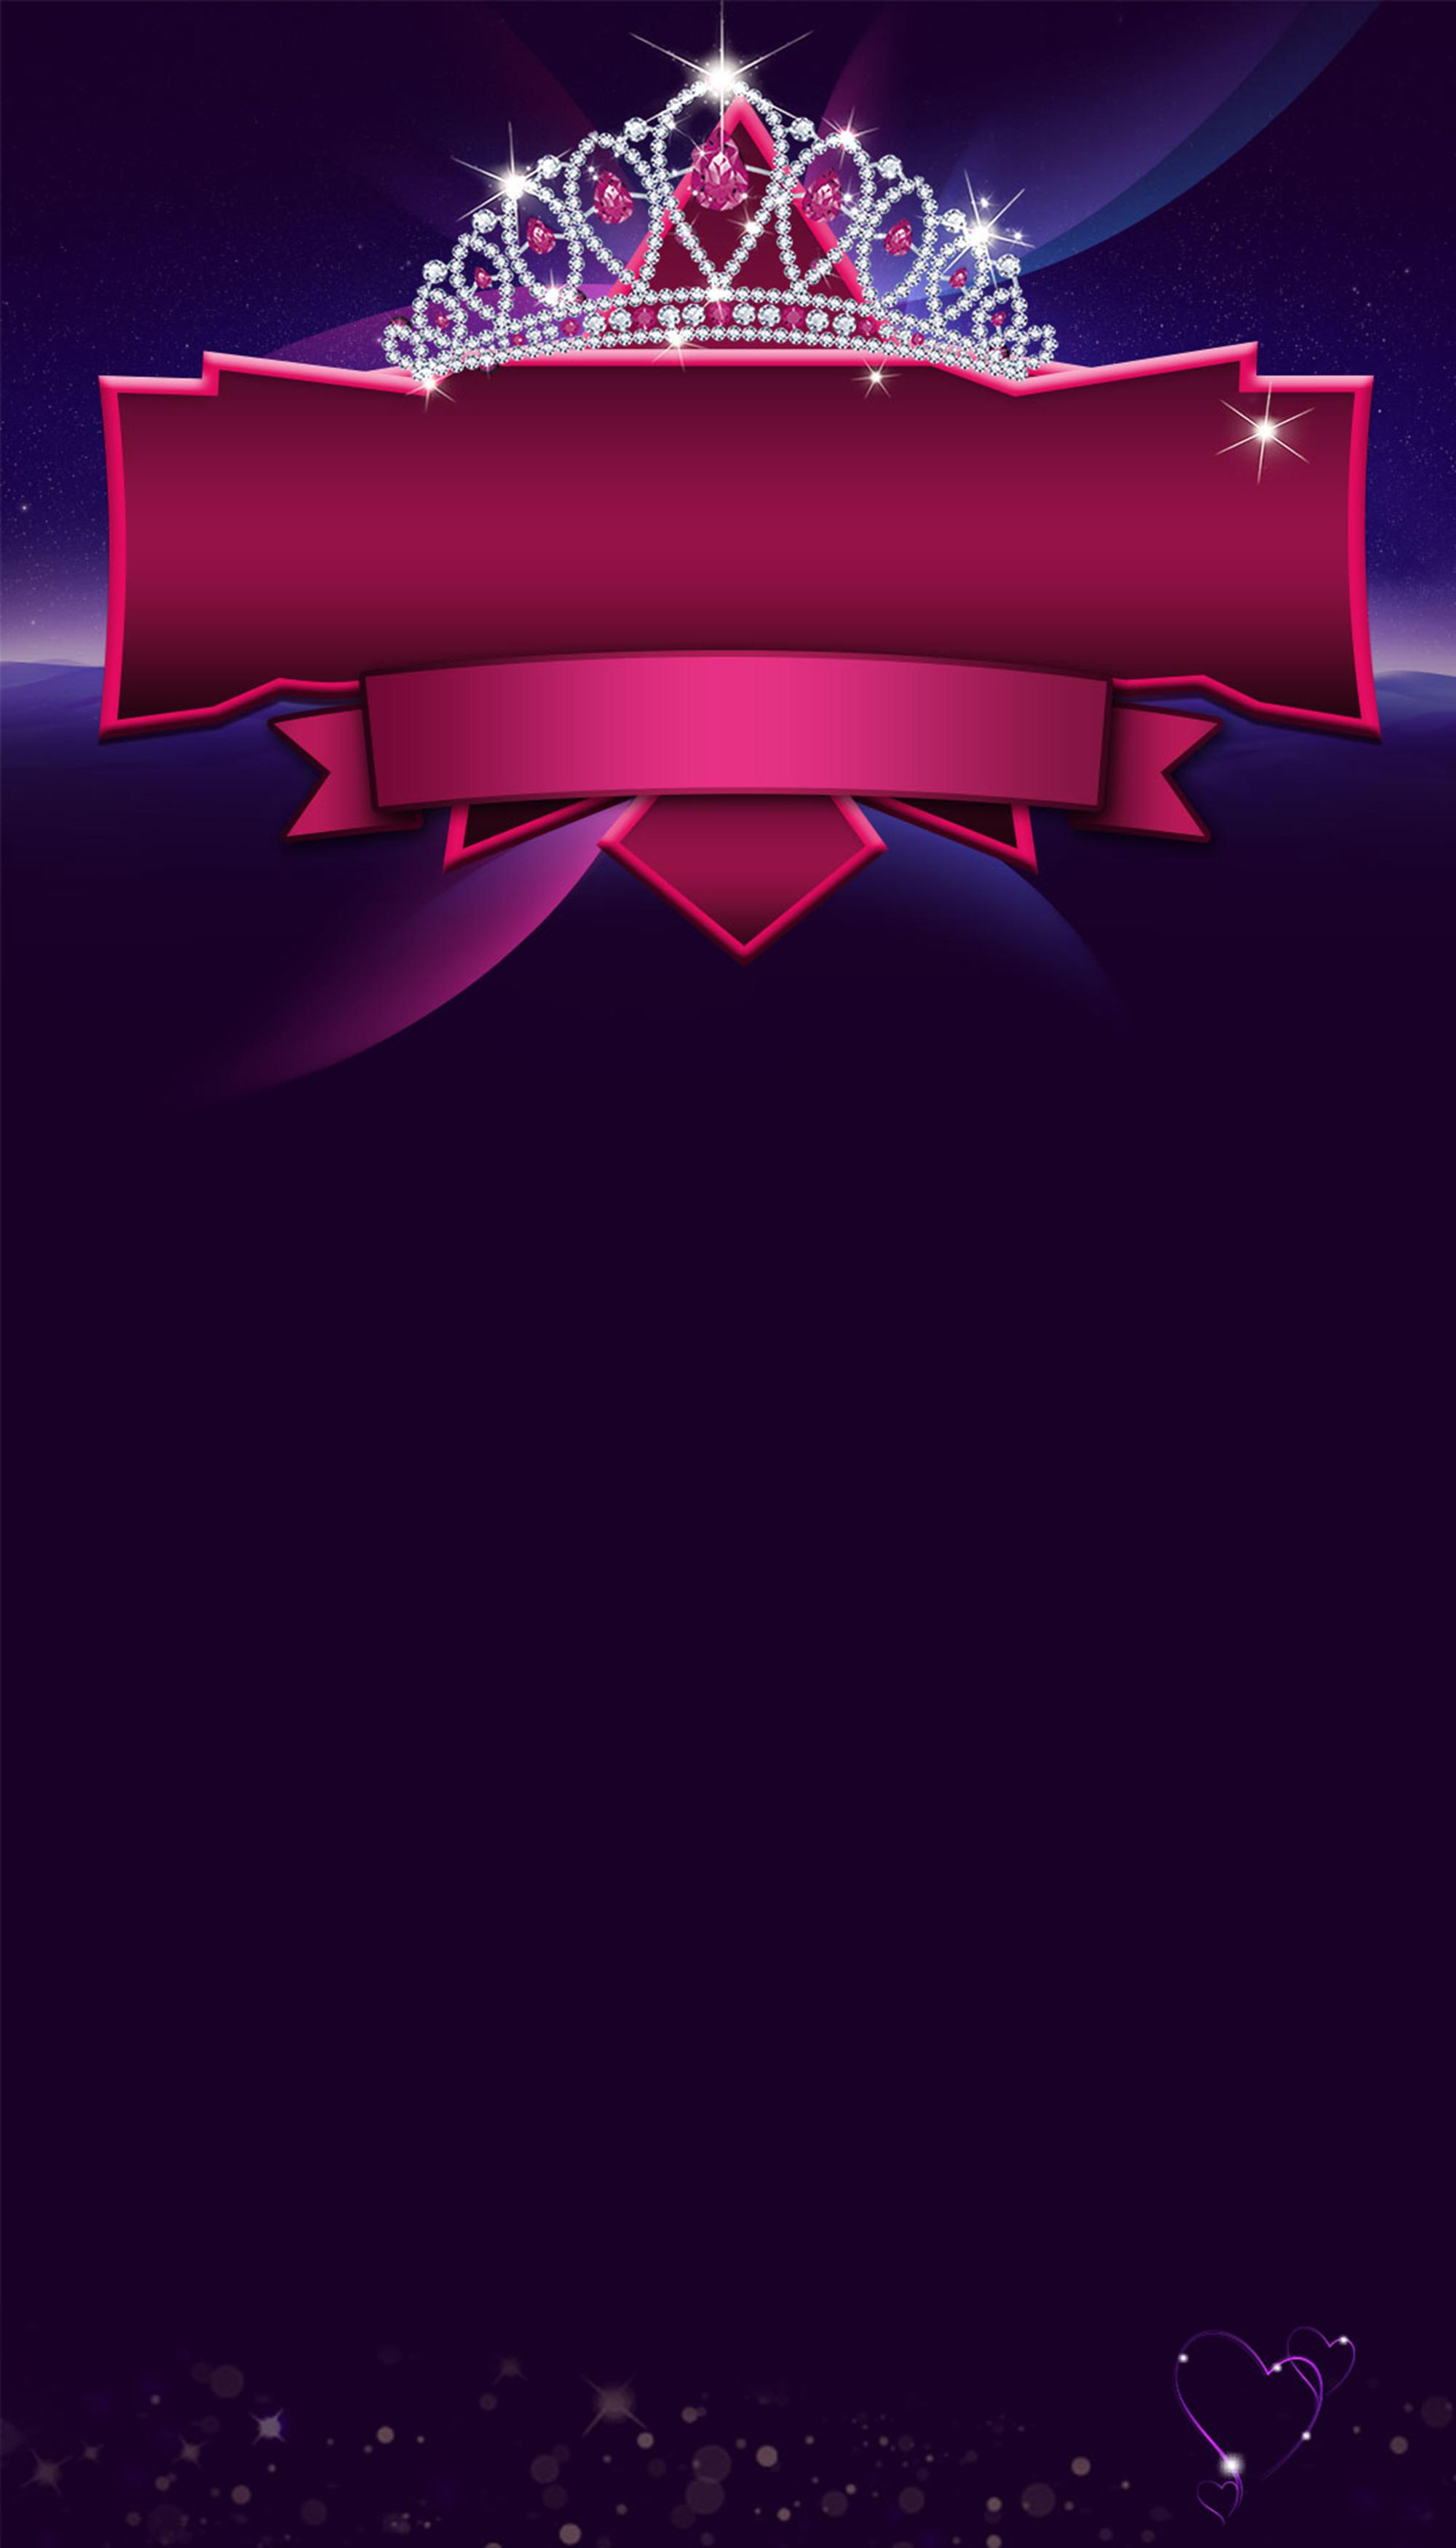 Purple Grades Crown Poster Background Purple Gradient